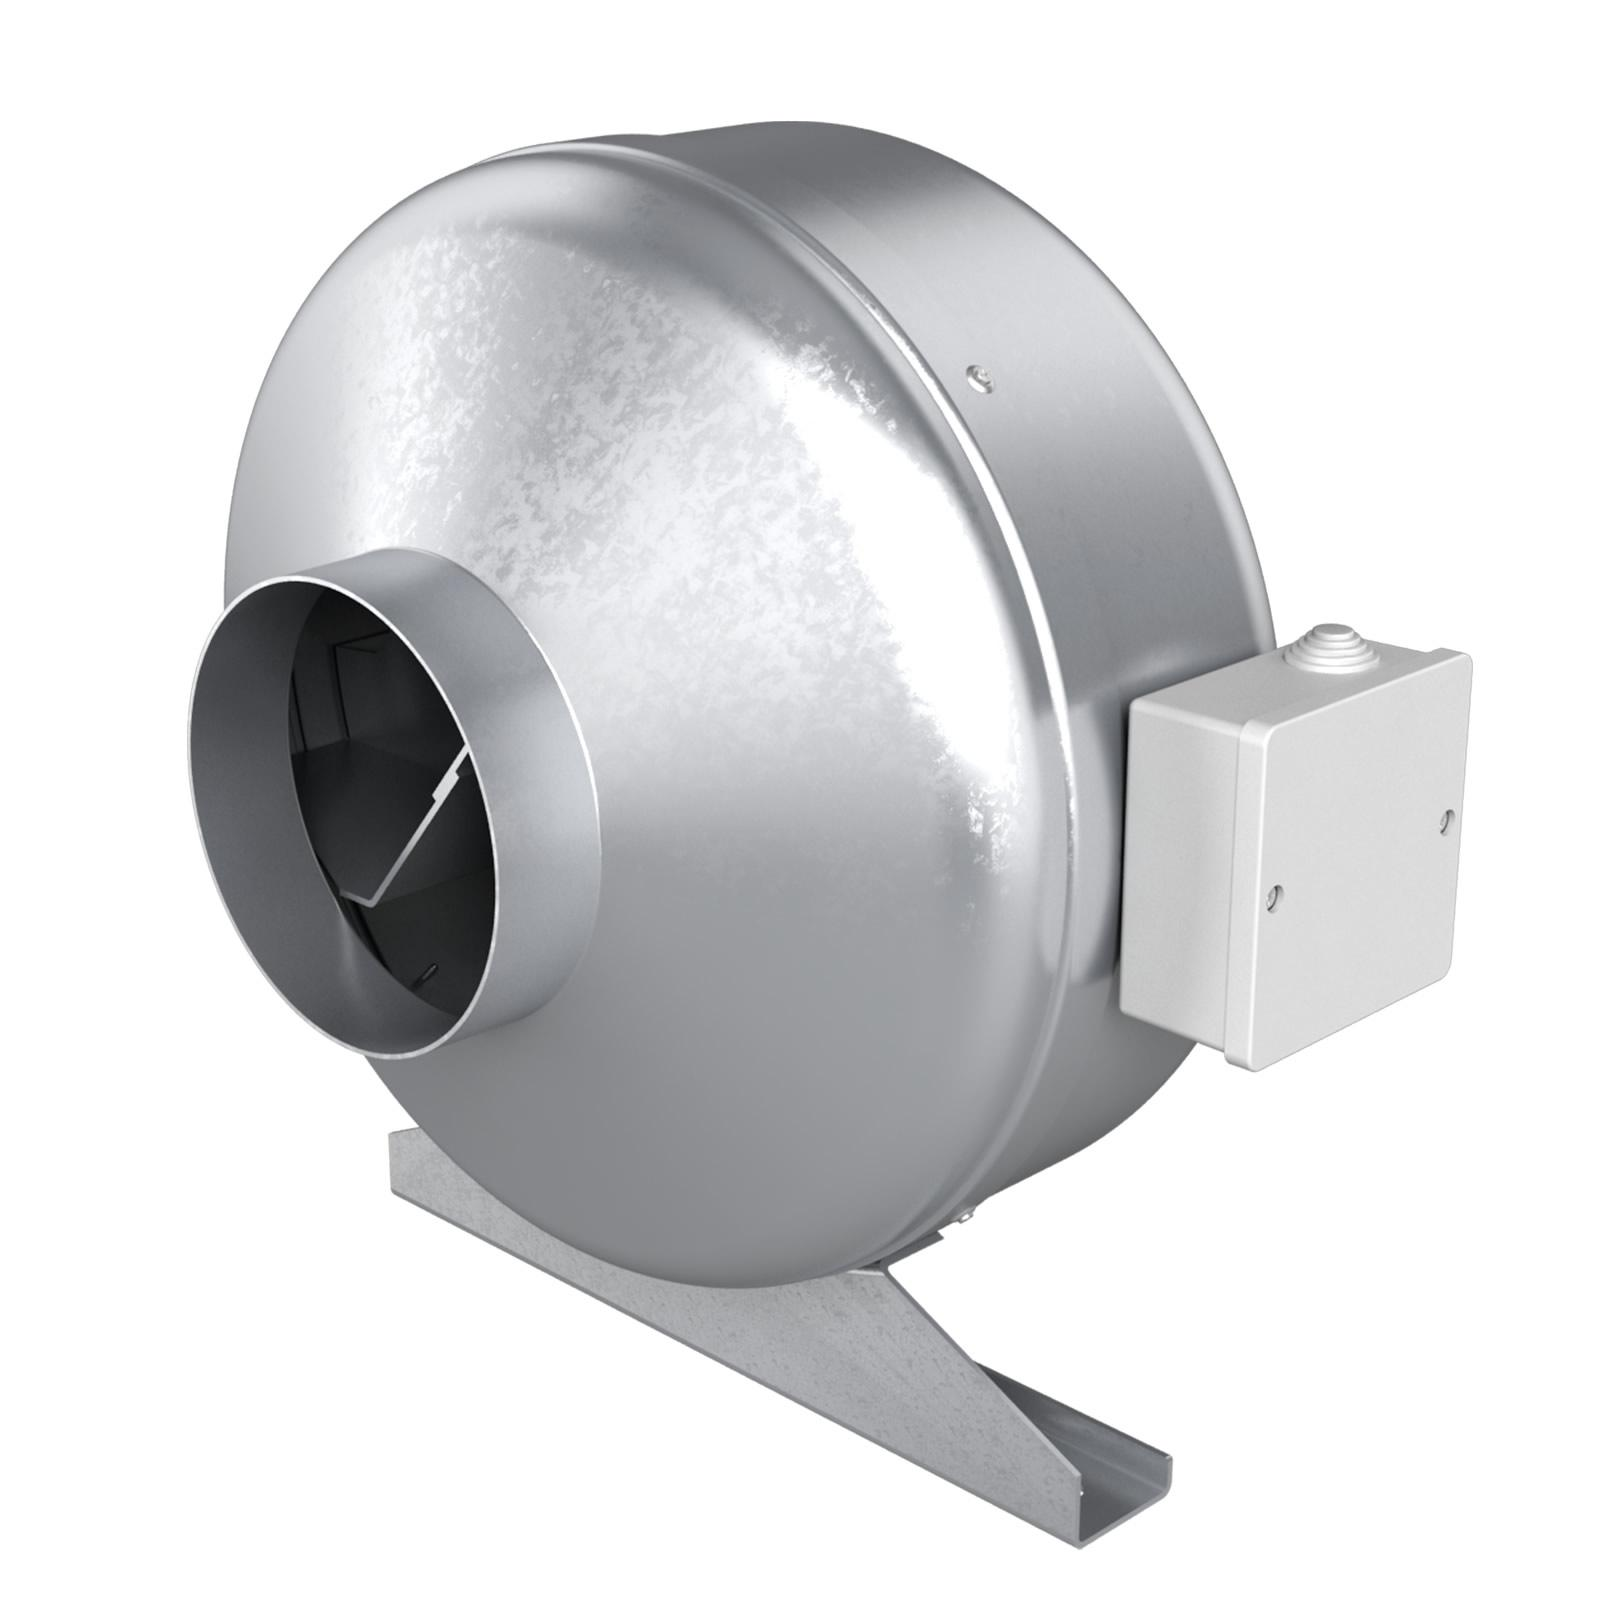 Вентилятор Era Mars gdf 200 era mars gdf 150 вентилятор центробежный канальный